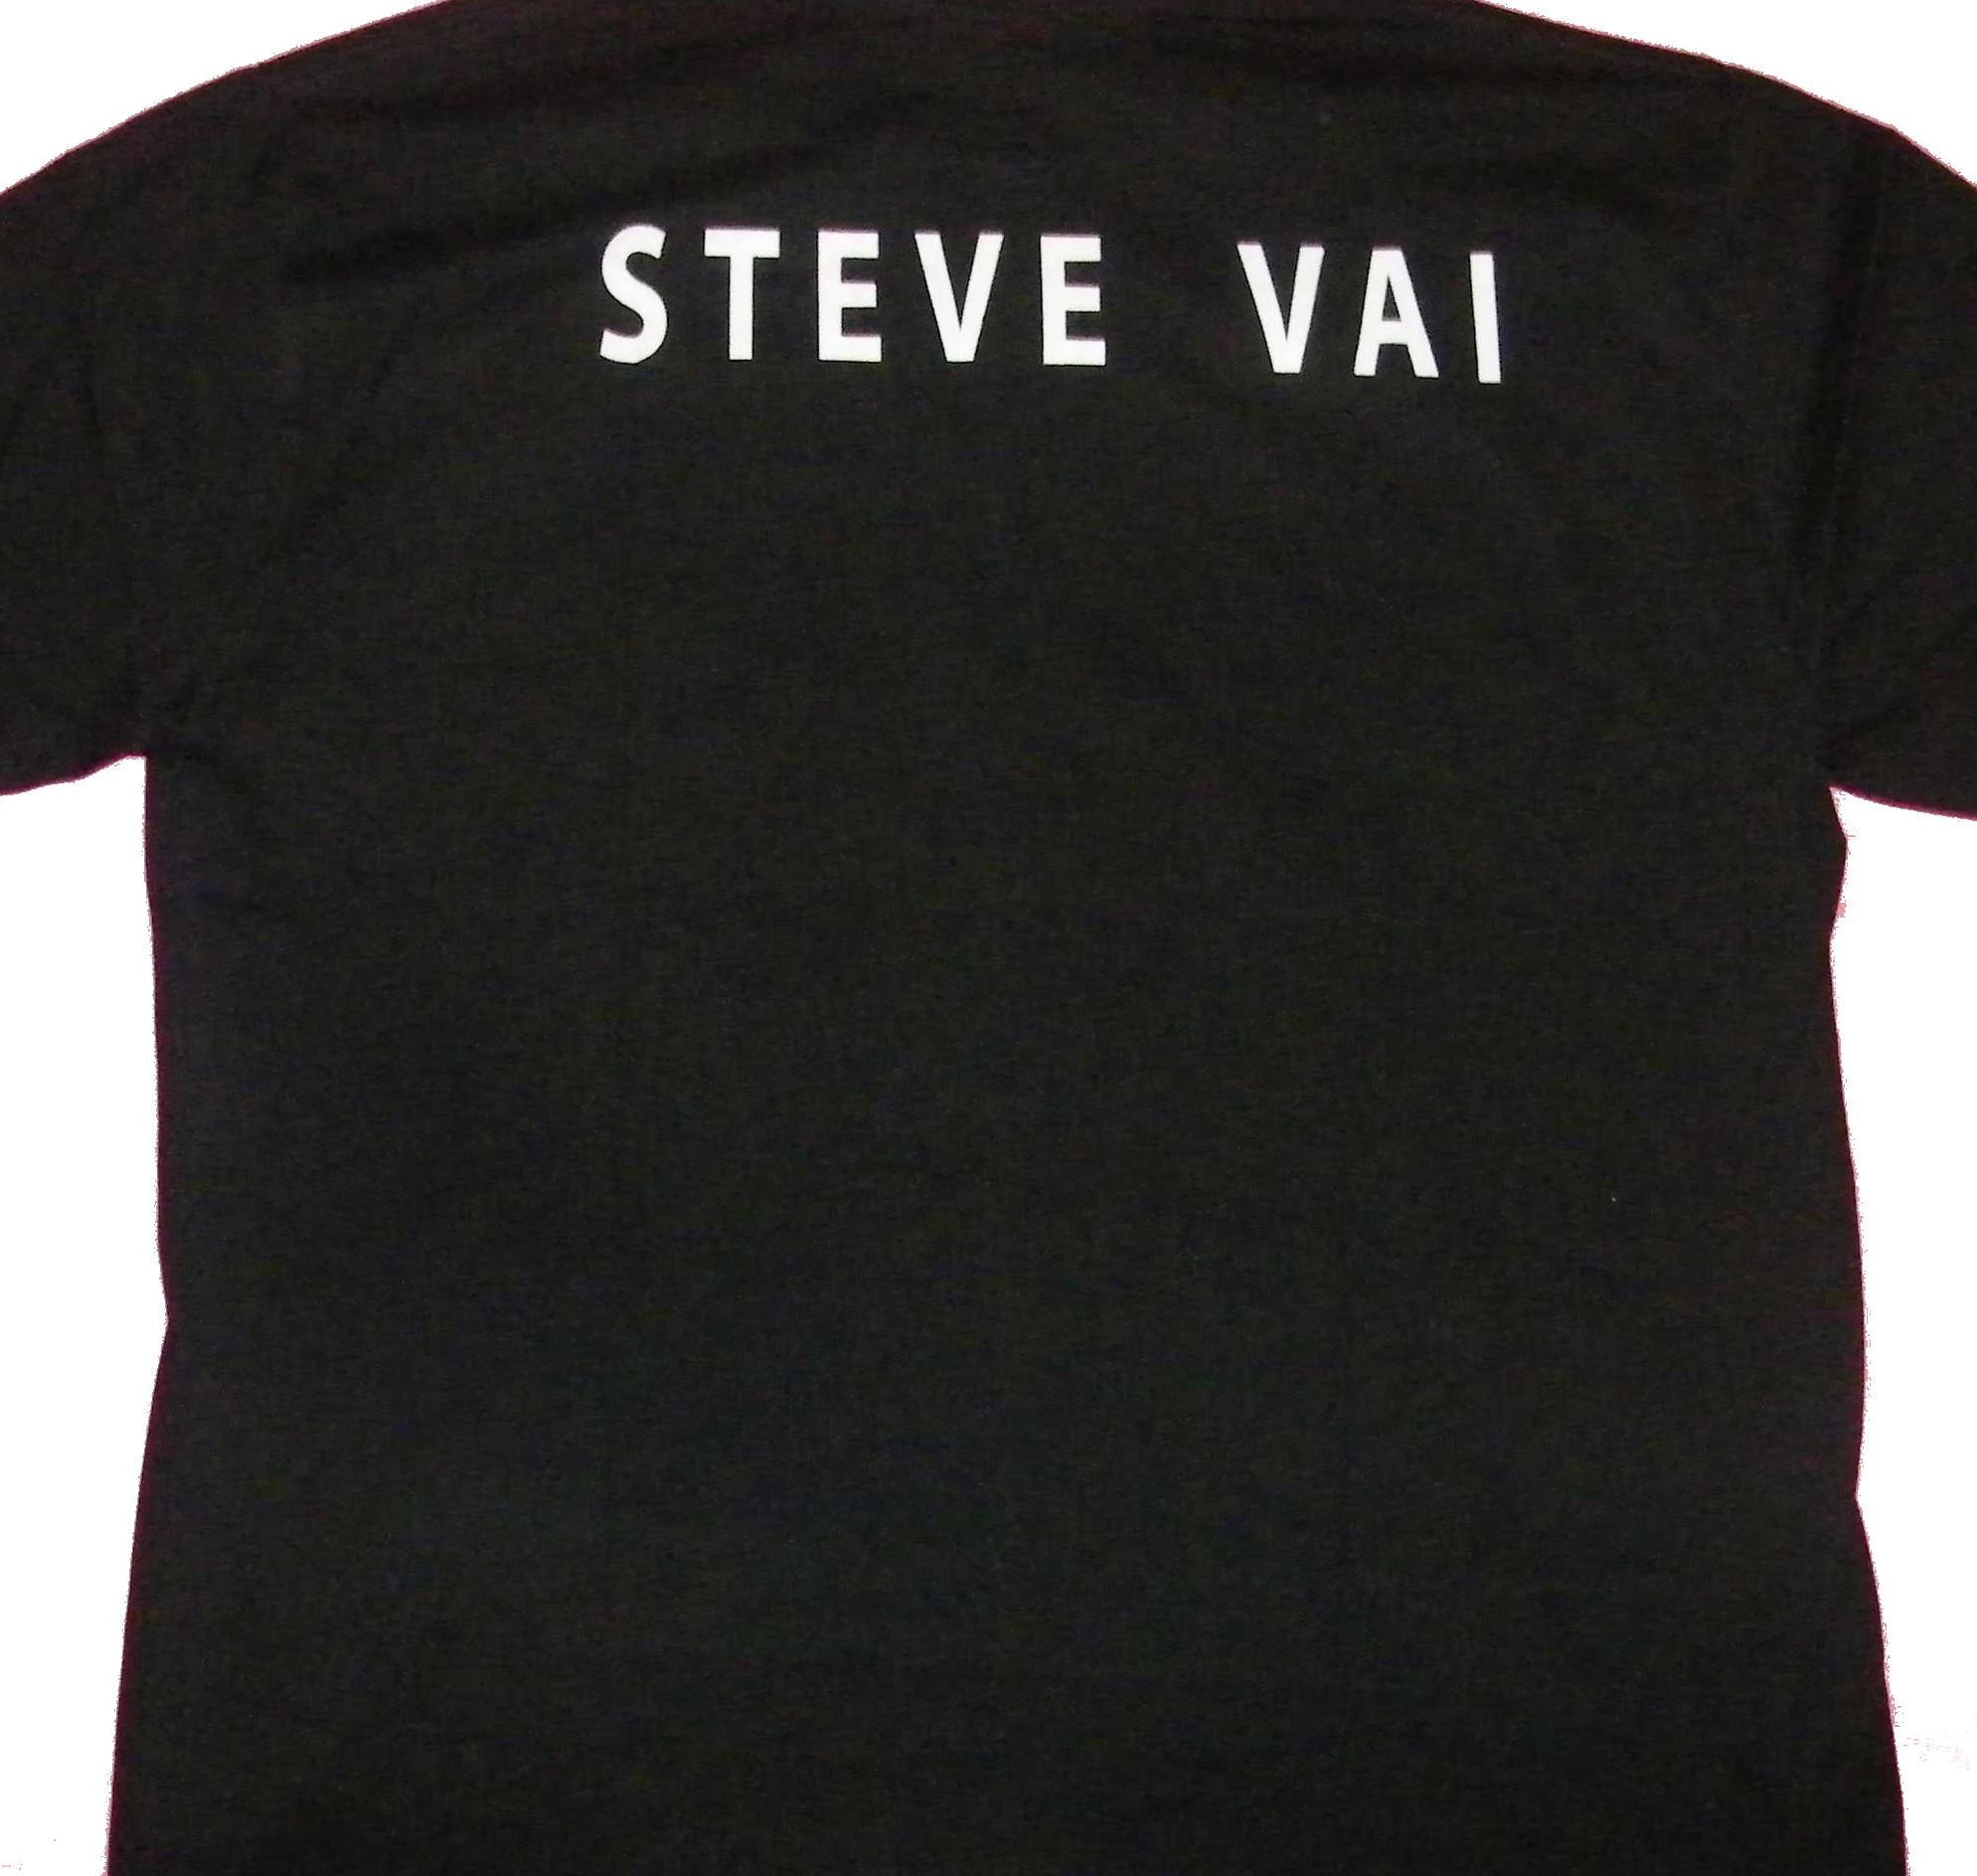 Xl T Shirt Steve Size Vai 1J3TKlcF